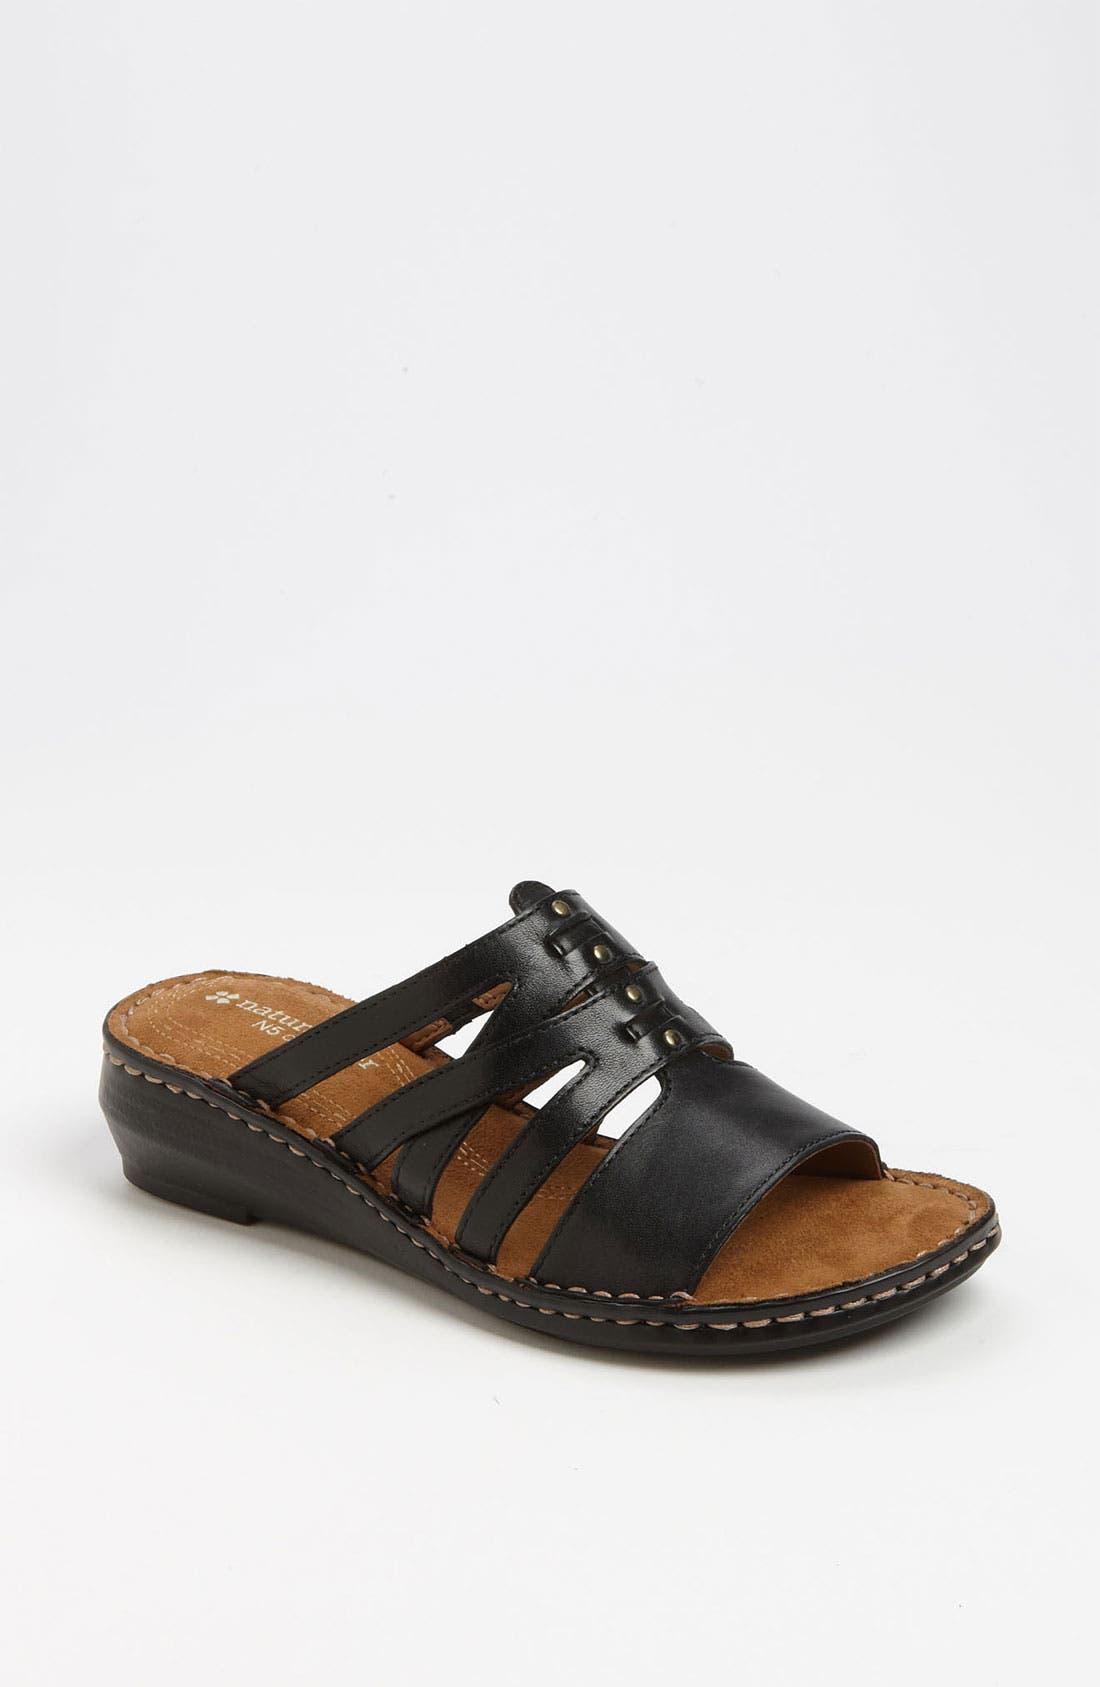 Main Image - Naturalizer 'Leanna' Sandal